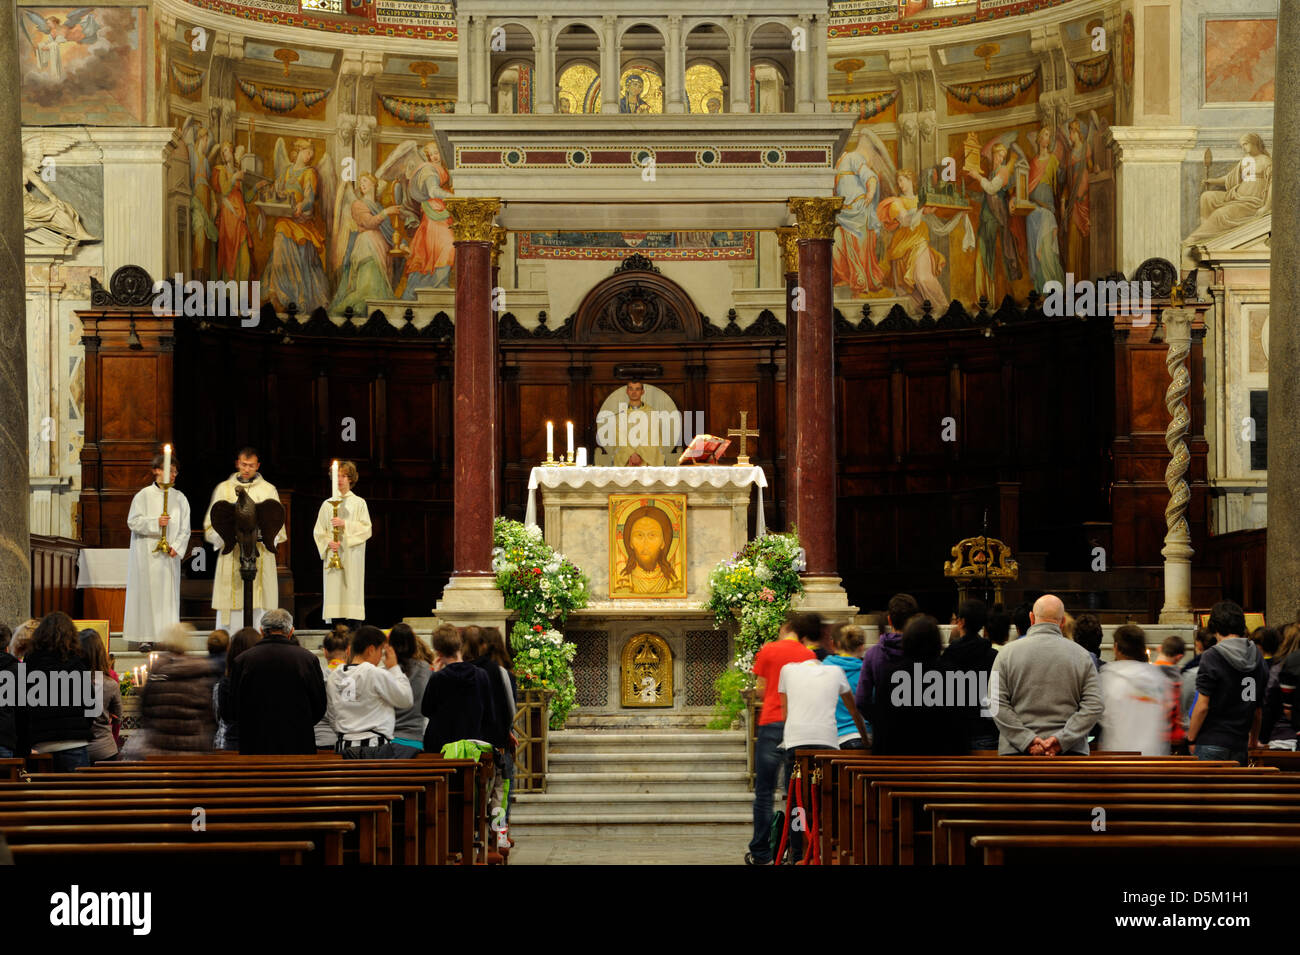 italy, rome, basilica of santa maria in trastevere, catholic mass - Stock Image